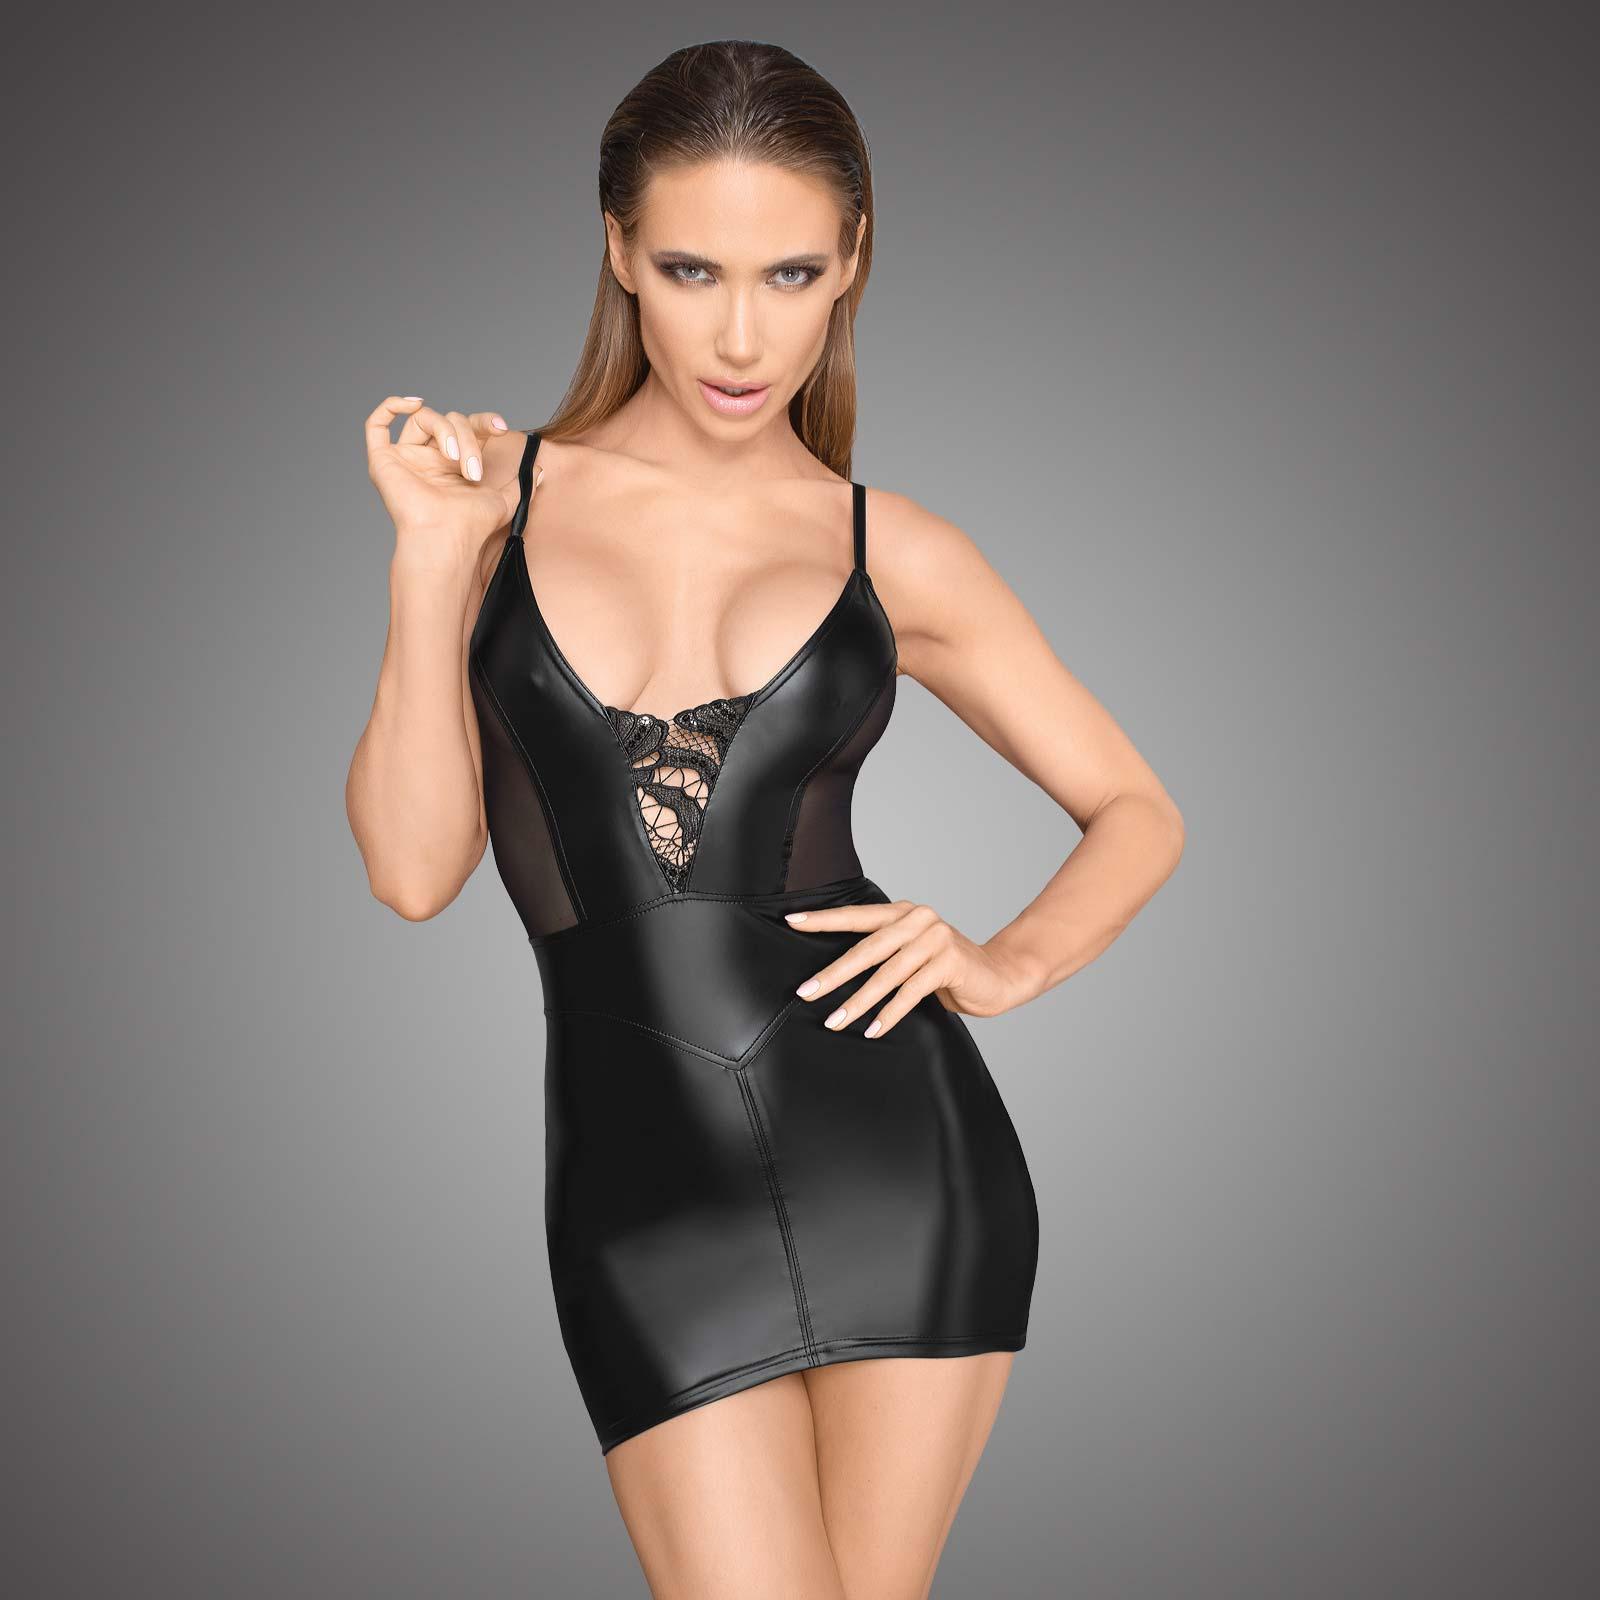 NOIR HANDMADE Wetlook Mini Dress